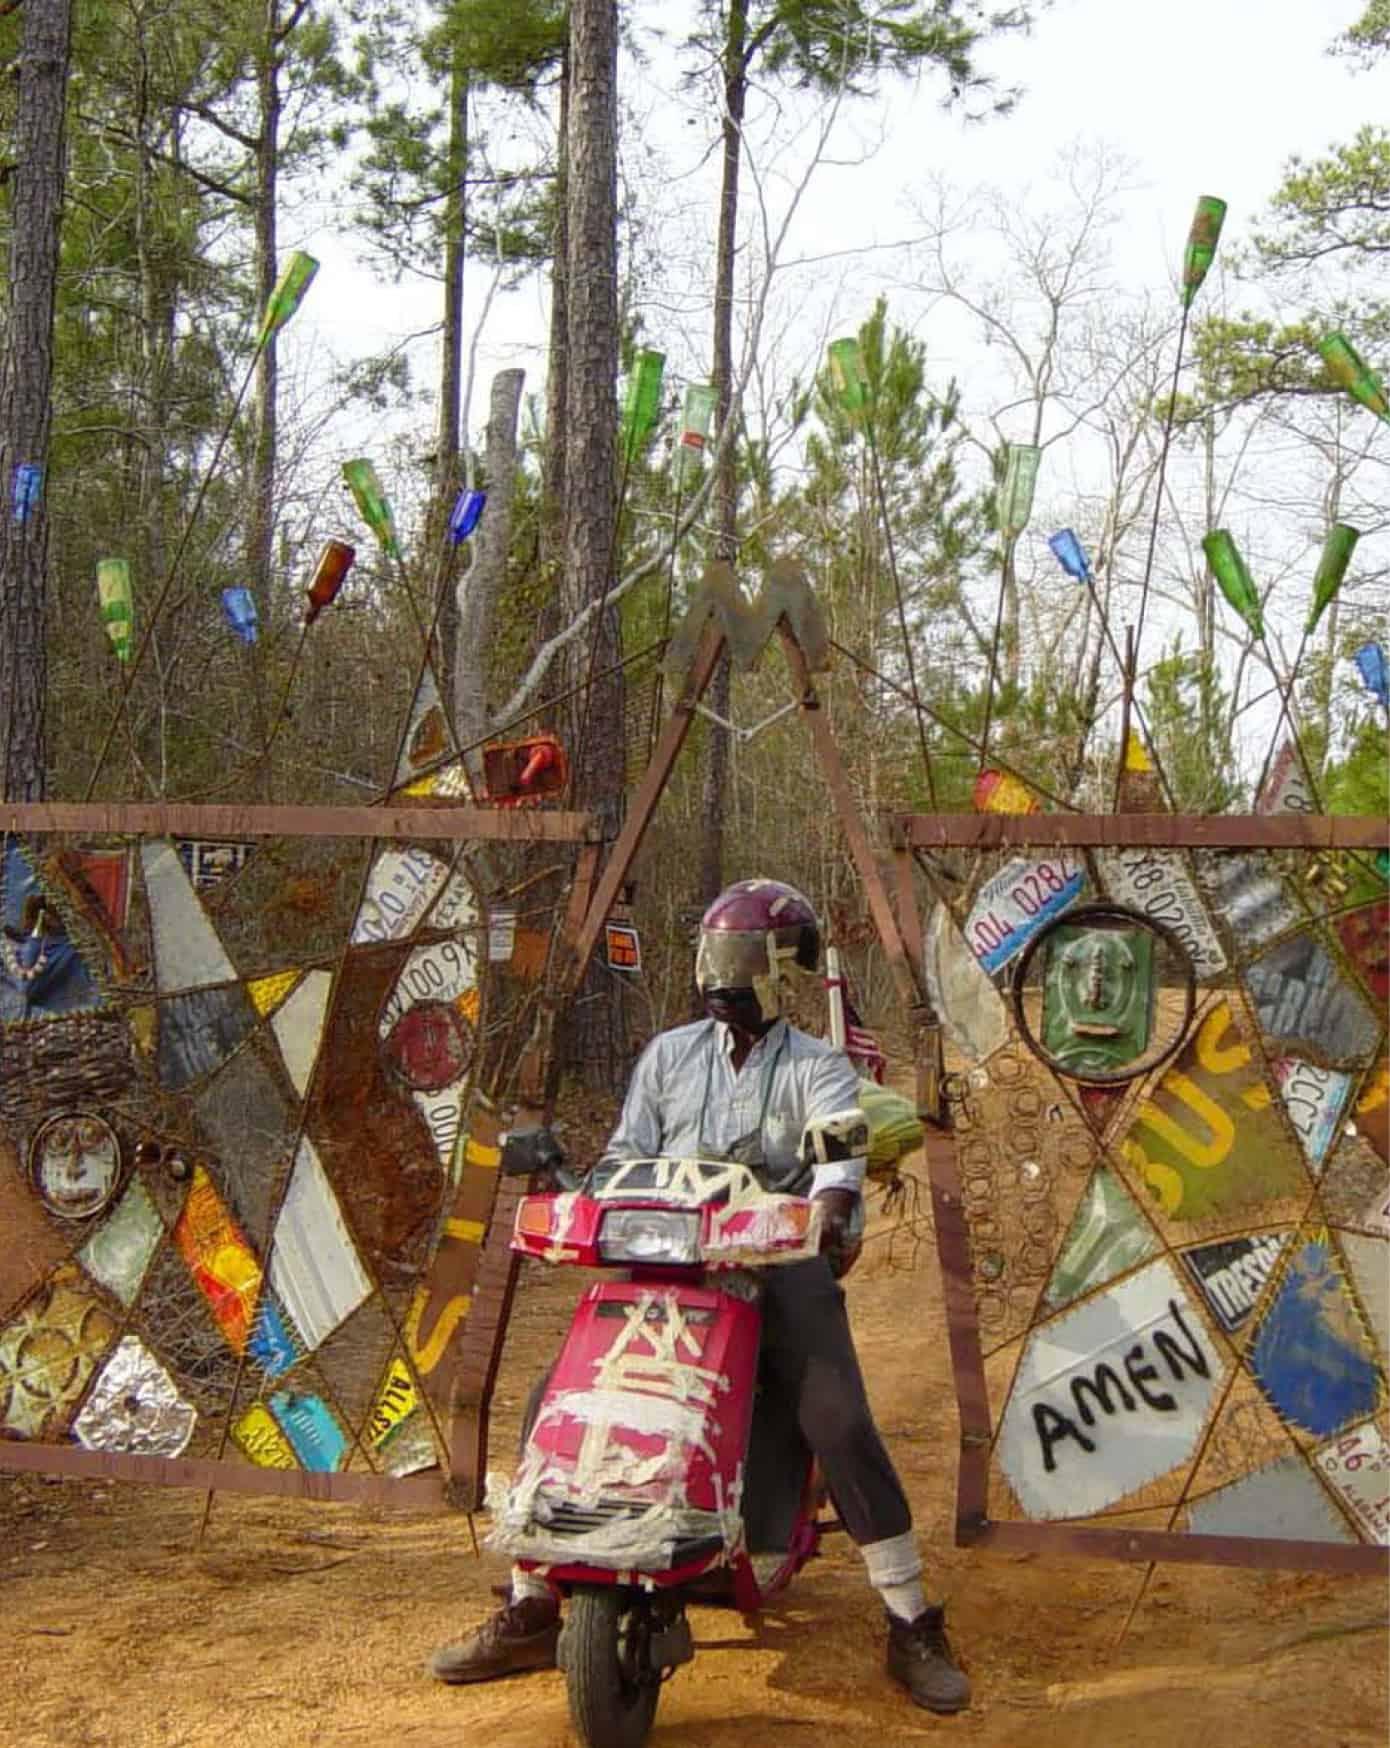 Music Man pulling through his custom gate in his motorcycle